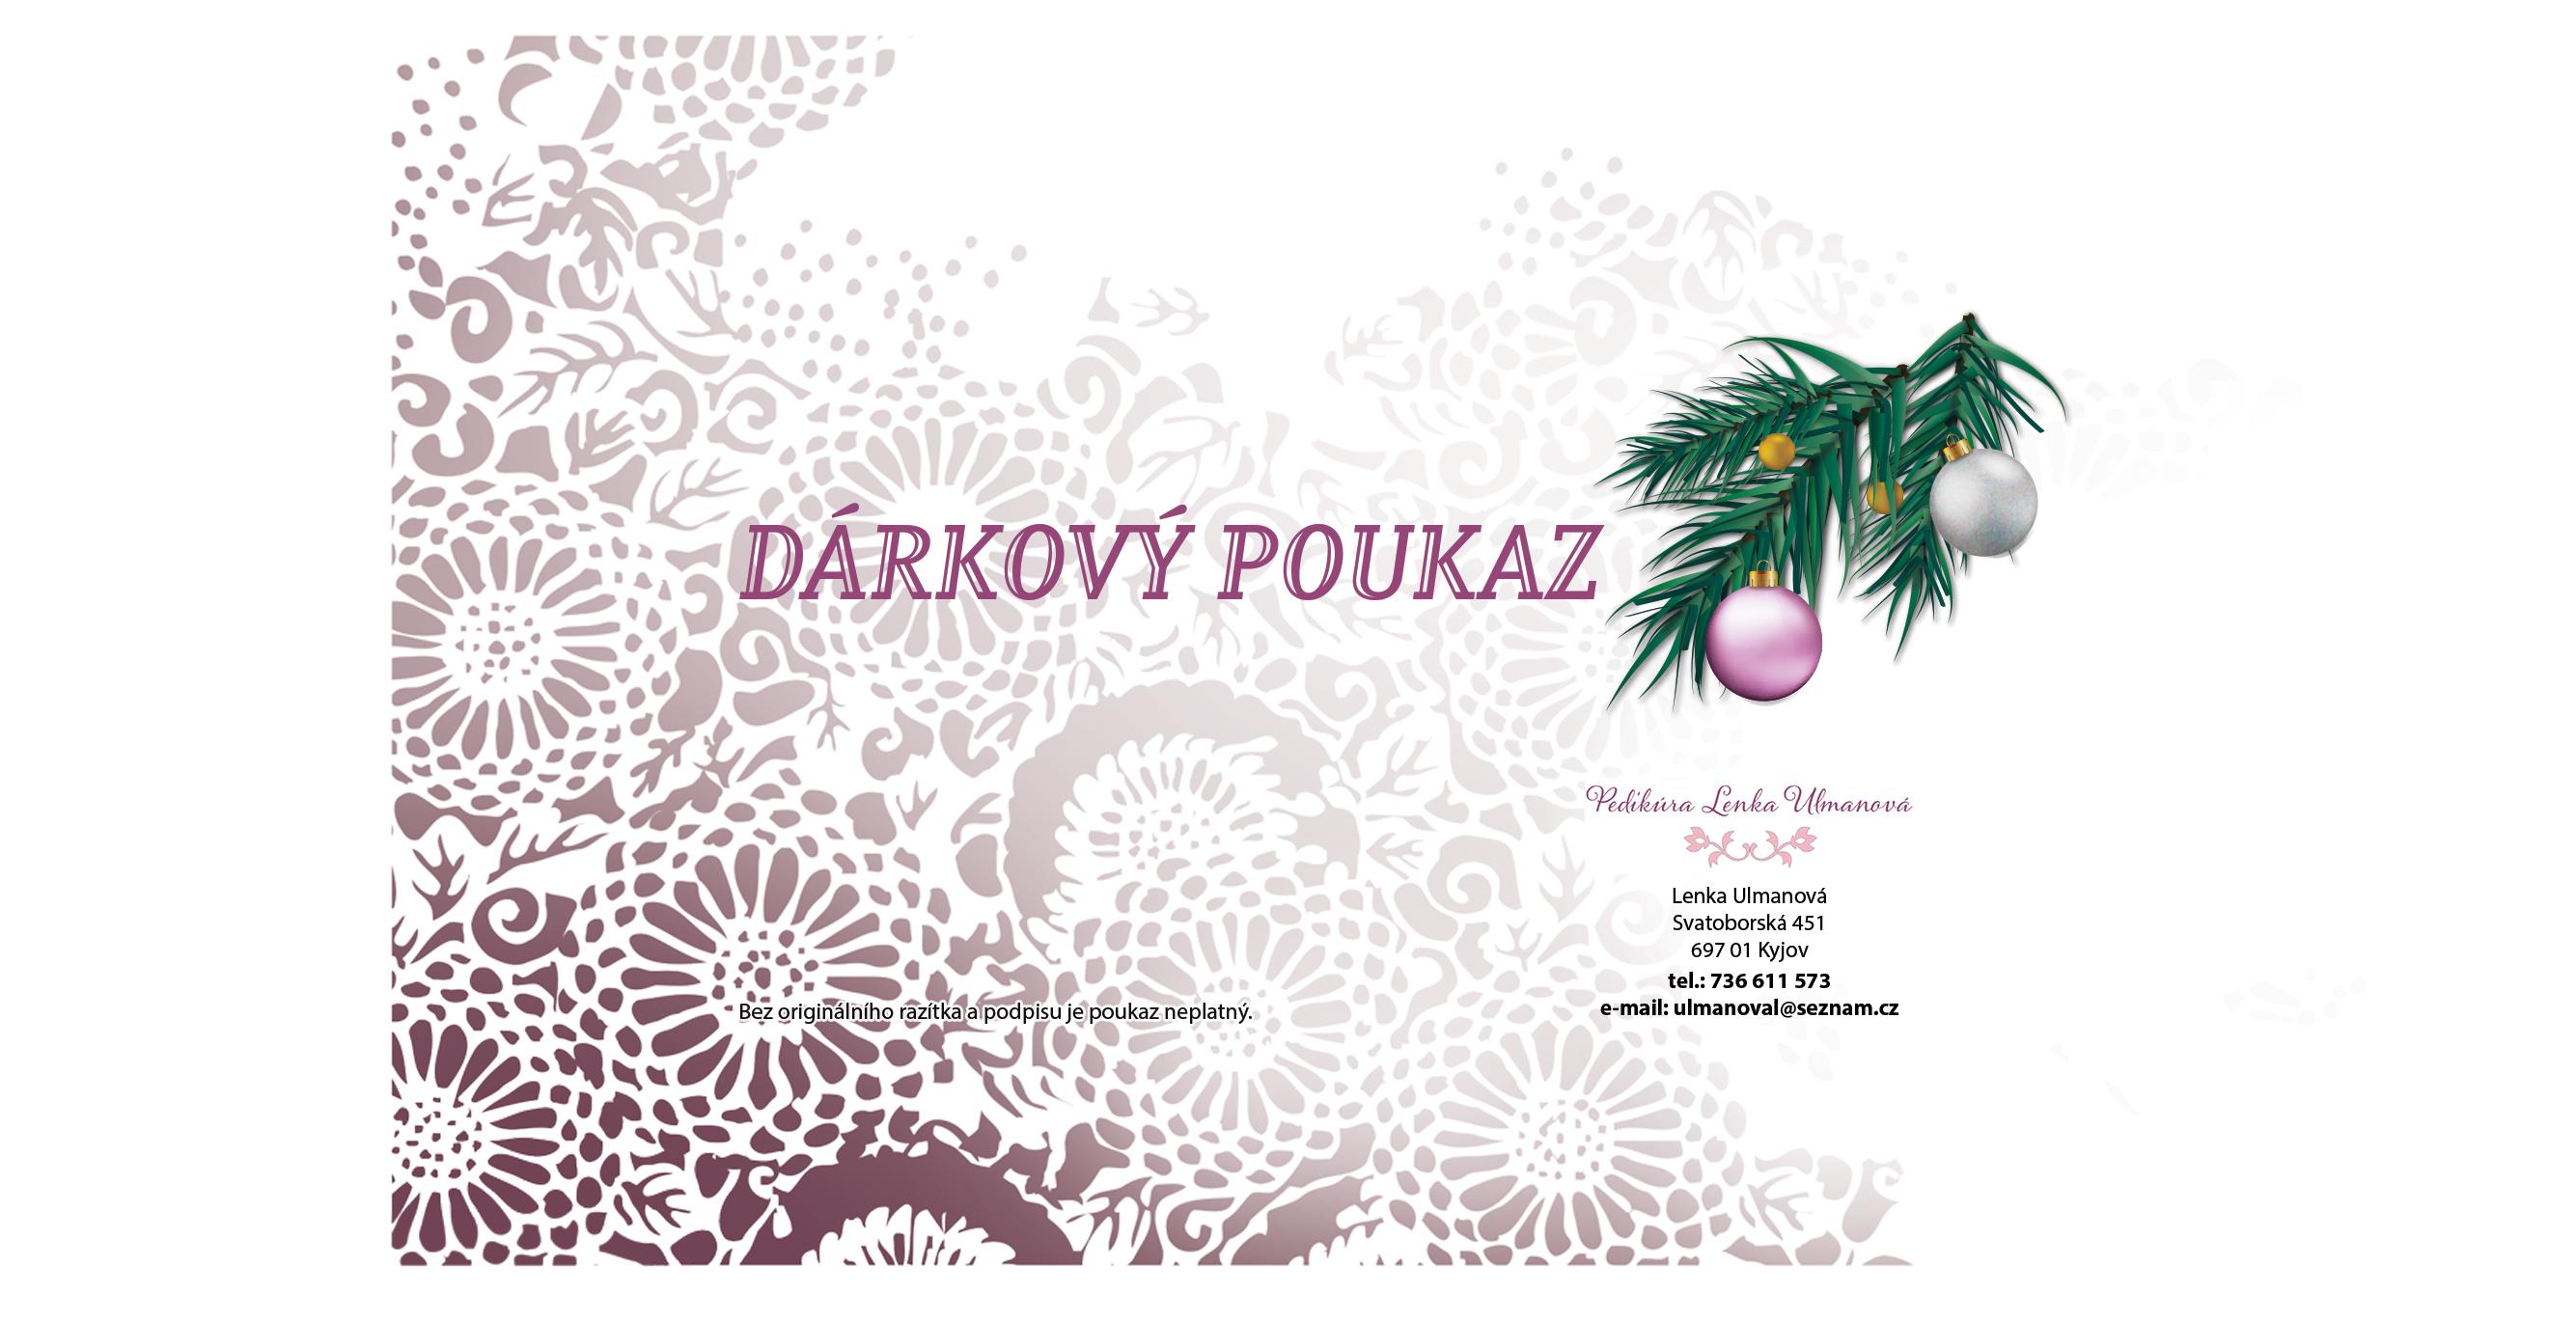 Darkovy Poukaz Pedikura Kyjov Lenka Ulmanova